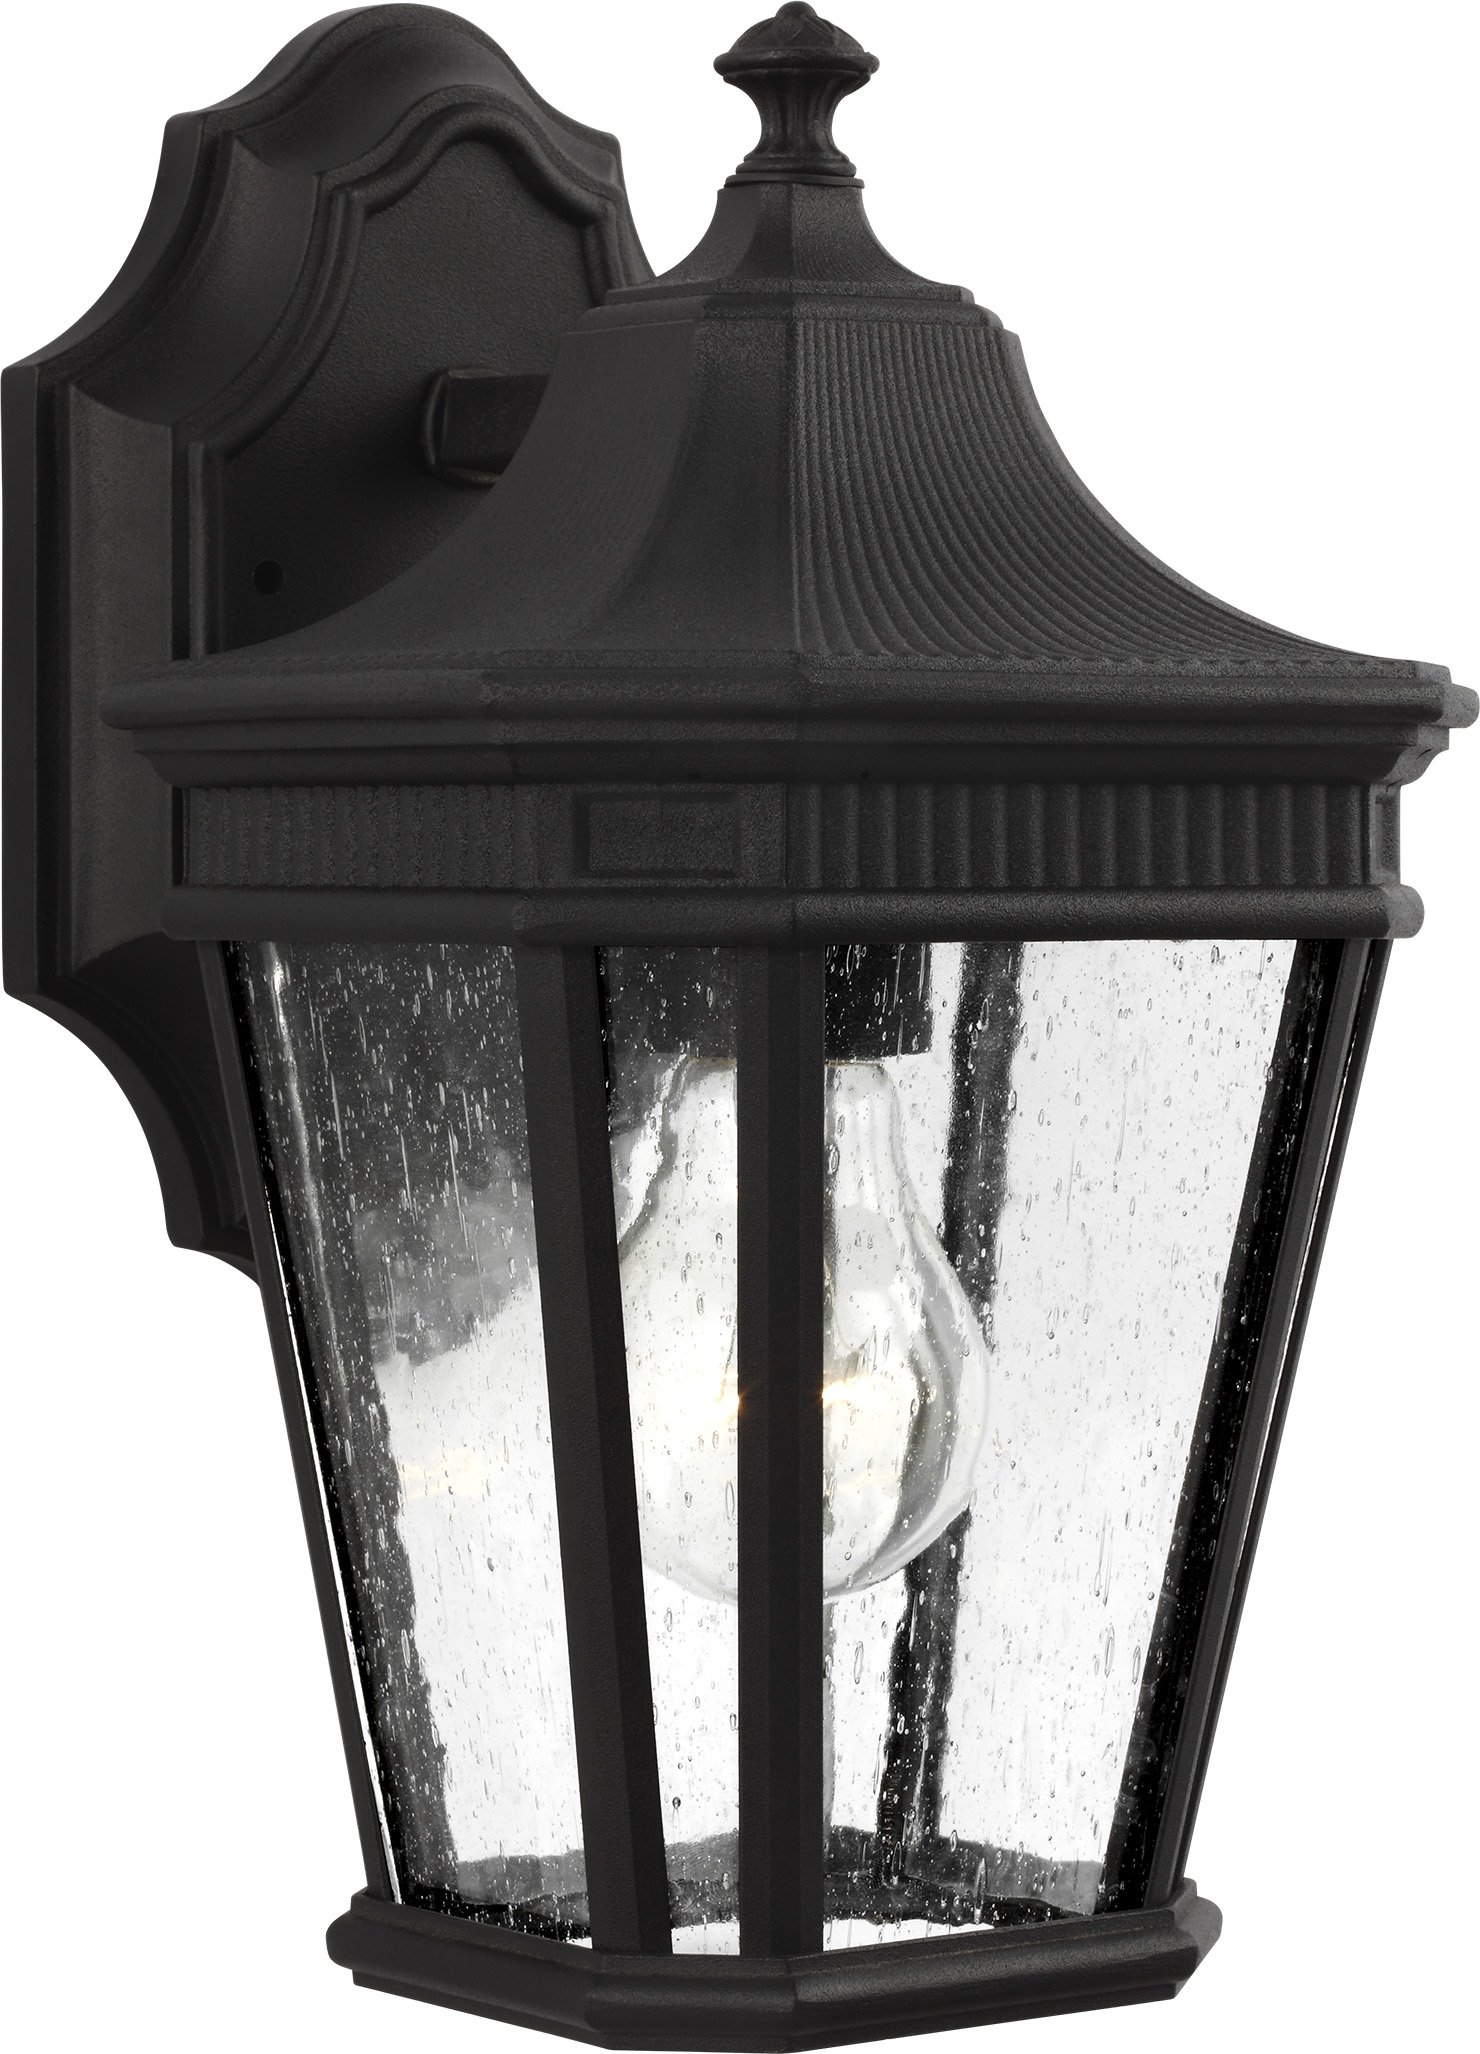 Feiss OL5420BK Cotswold Lane Outdoor Patio Lighting Wall Lantern, Black, 1-Light (7''W x 12''H) 100watts